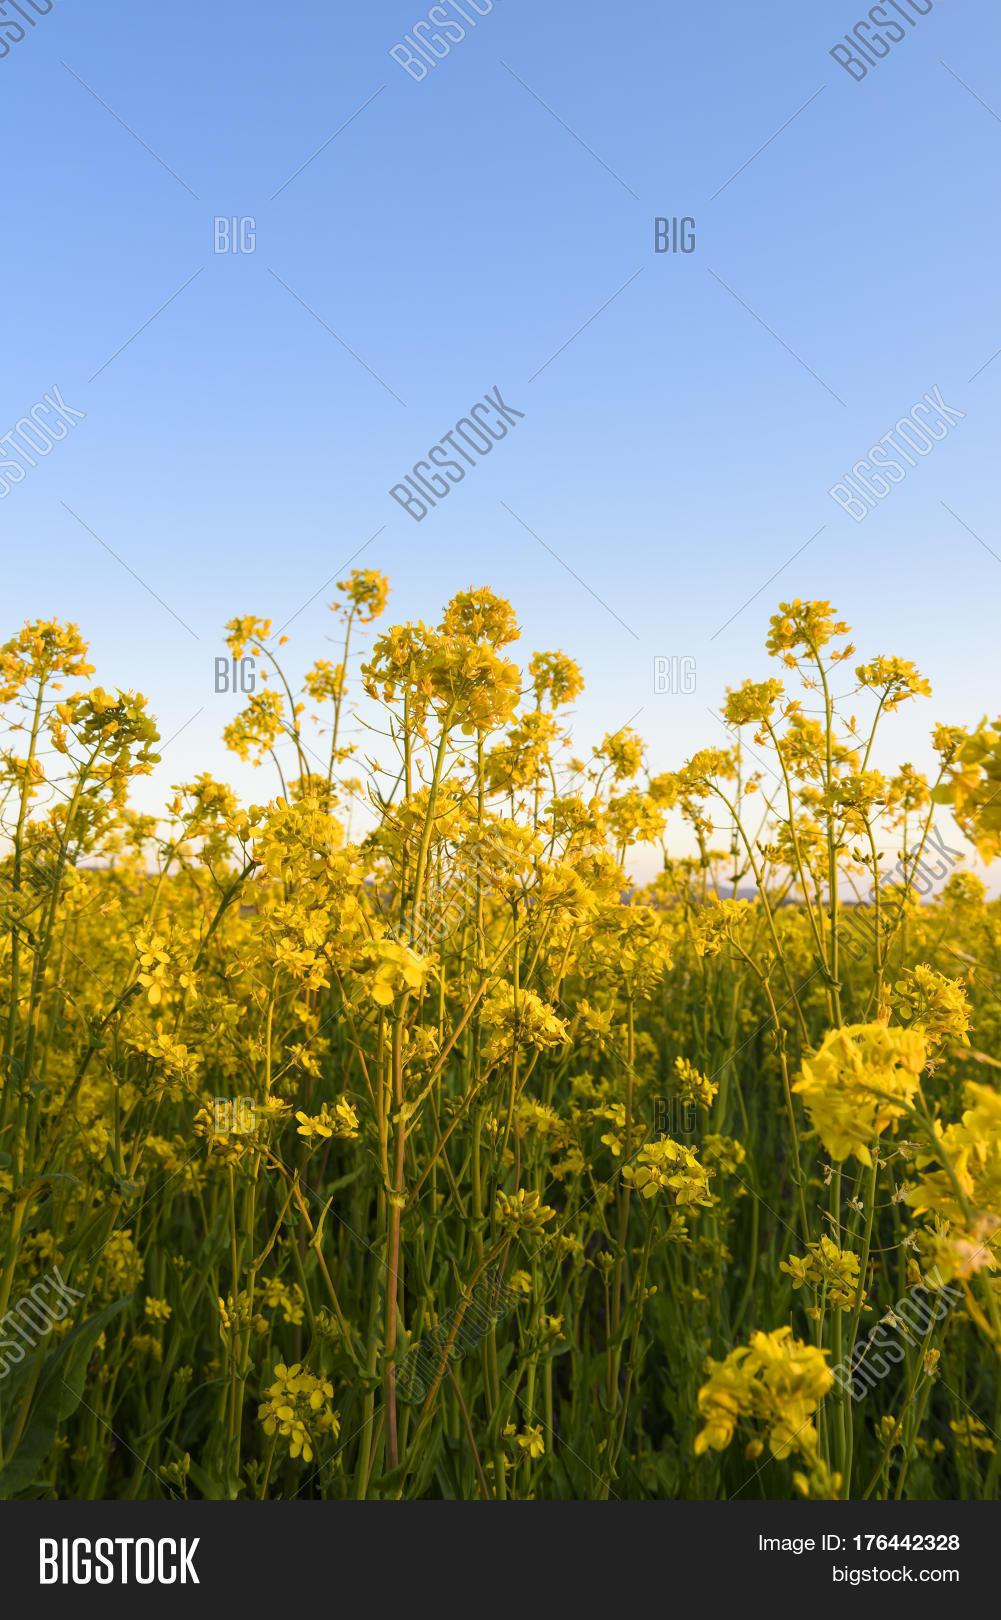 Farm Field Yellow Image Photo Free Trial Bigstock